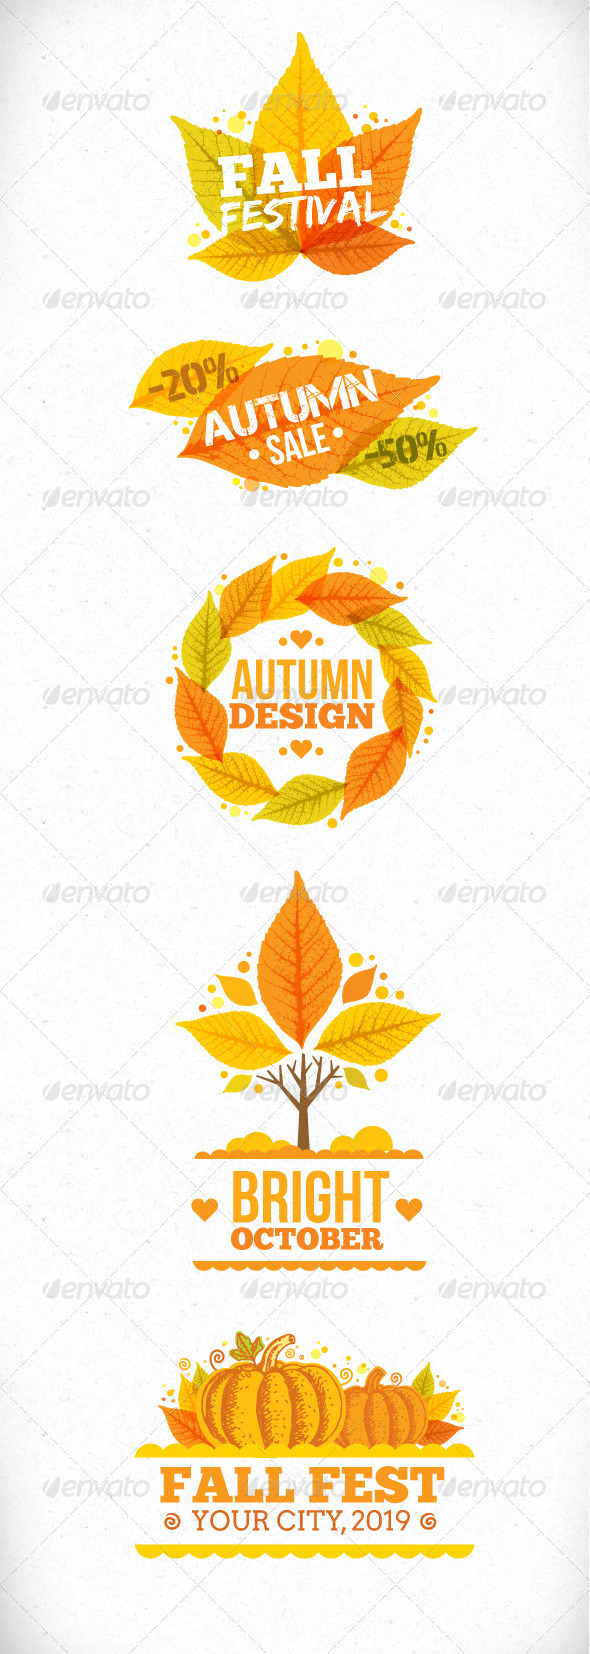 GraphicRiver Autumn Leaves Vector Art Design Elements 5210823